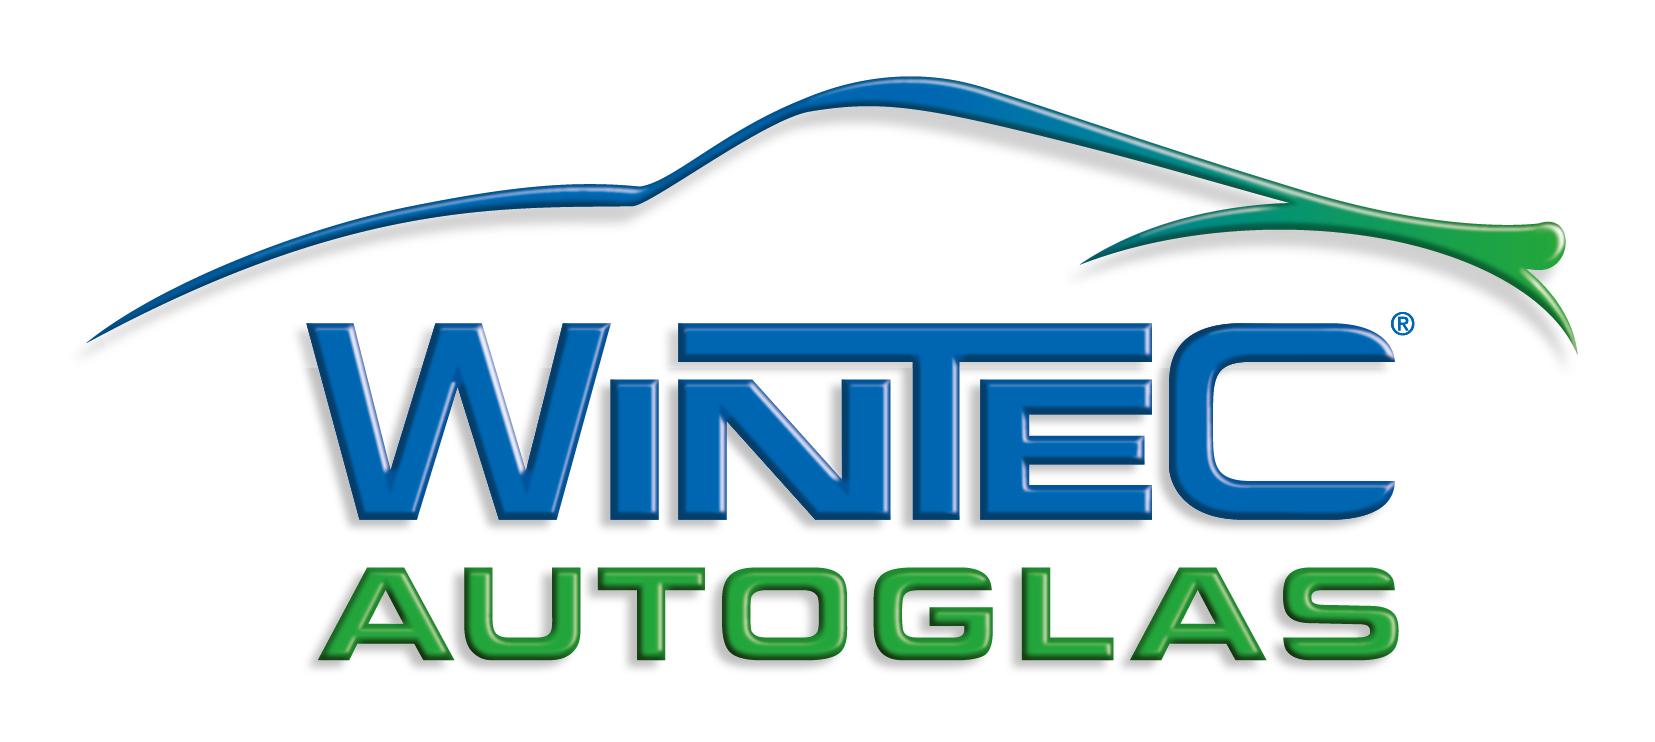 Wintec Autoglas Lackier- und Karosserie-Zentrum Resing